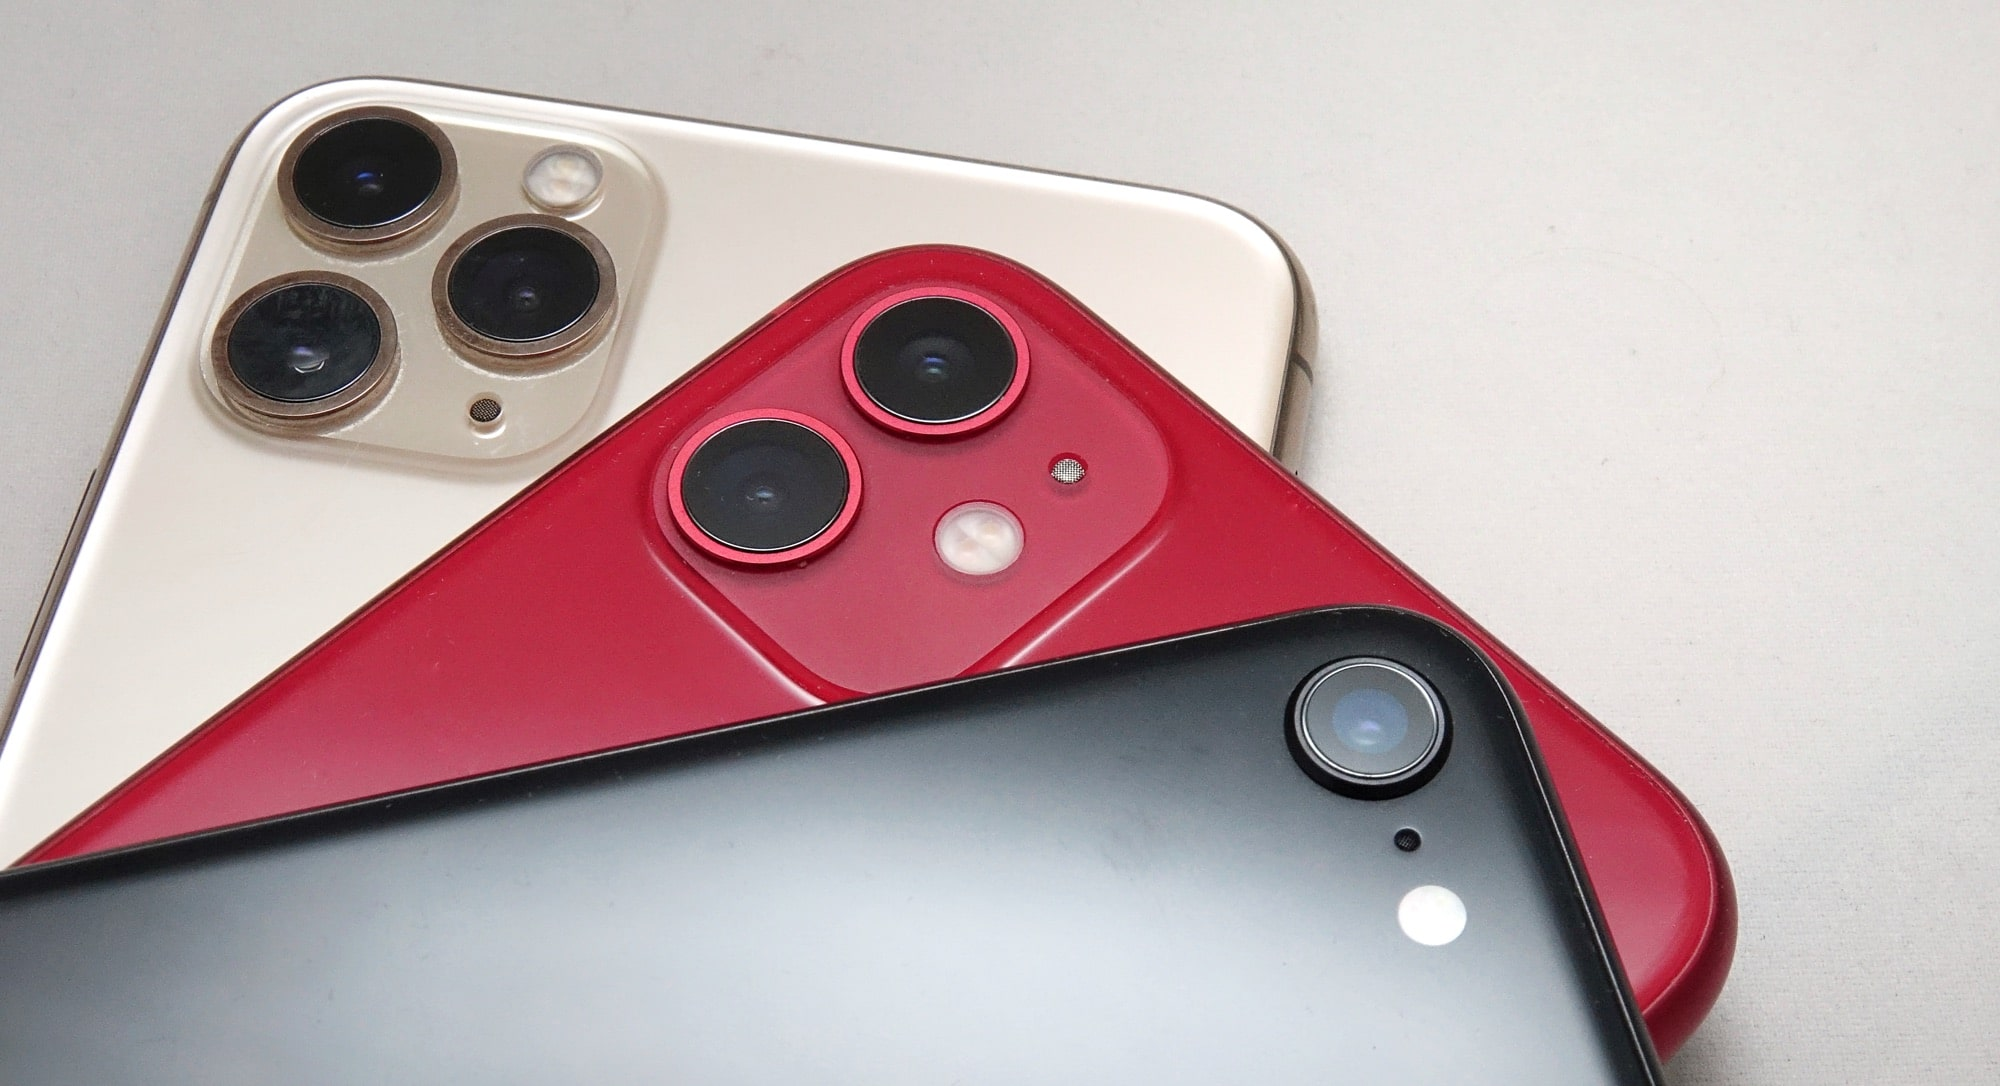 Apple iPhone SE camera against the 11 range